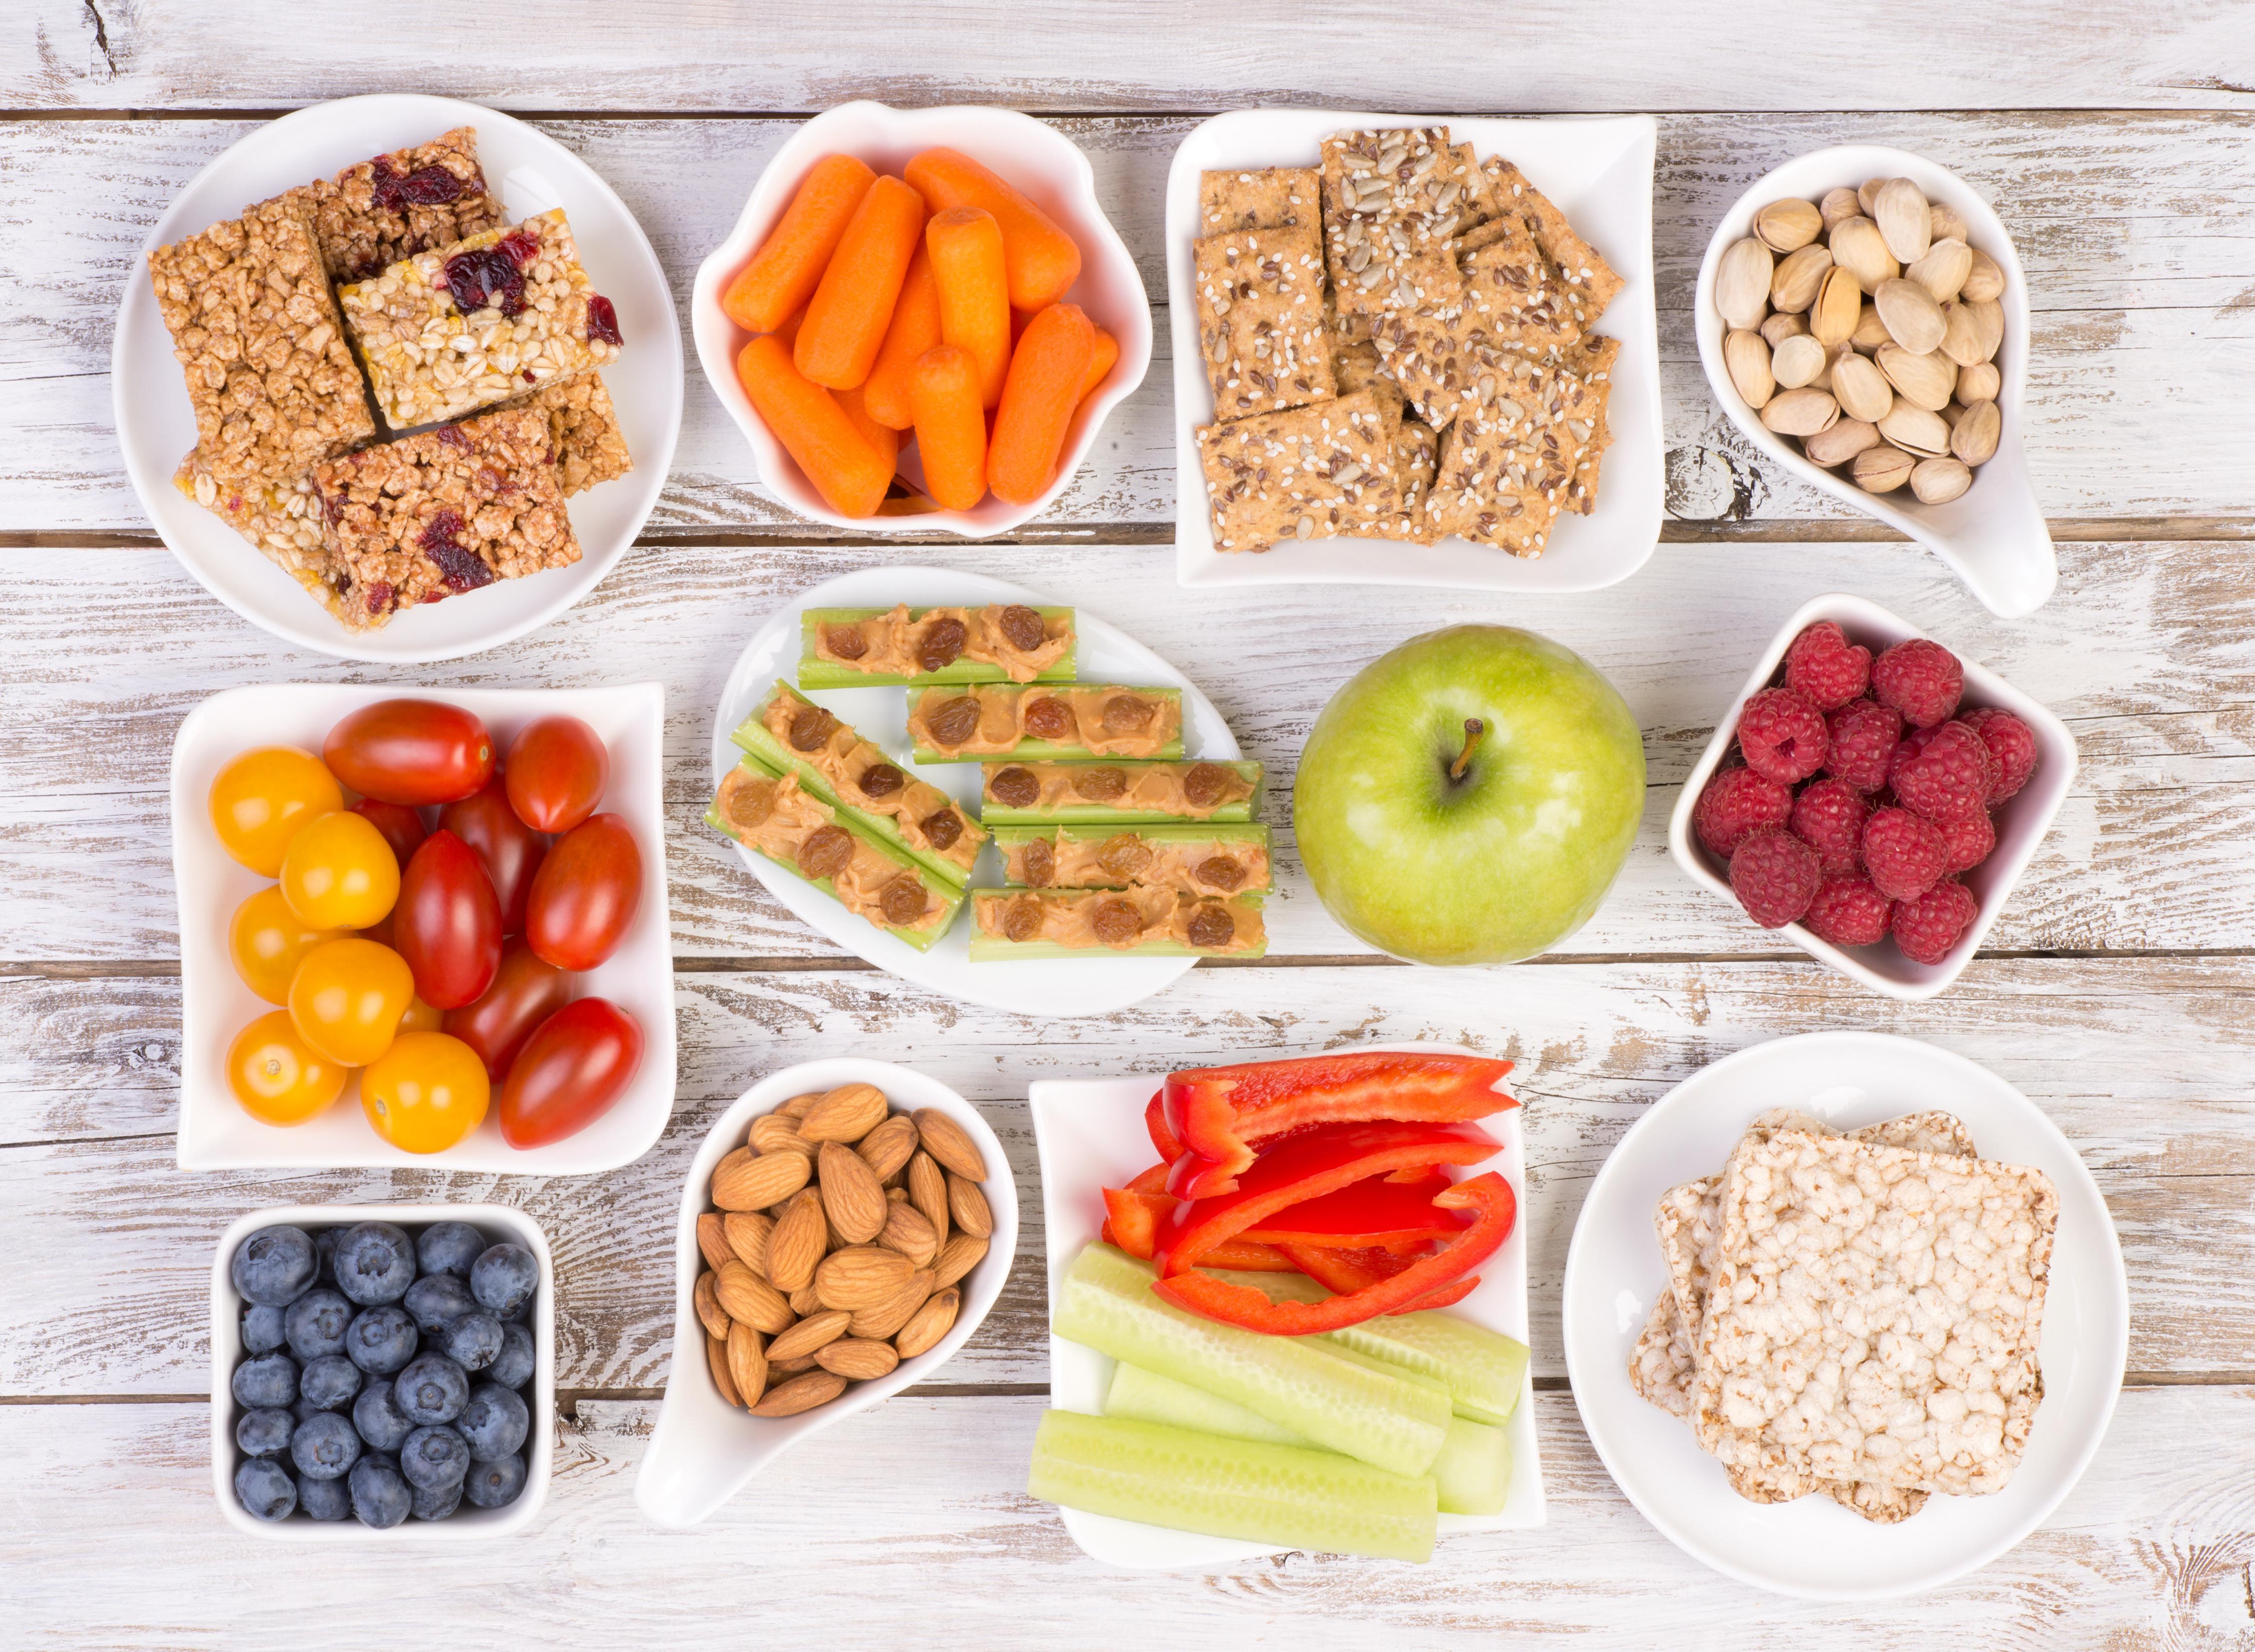 Healthy Filling Snacks  Five Filling Snacks to Help You Eat Healthy – karen sutton MD